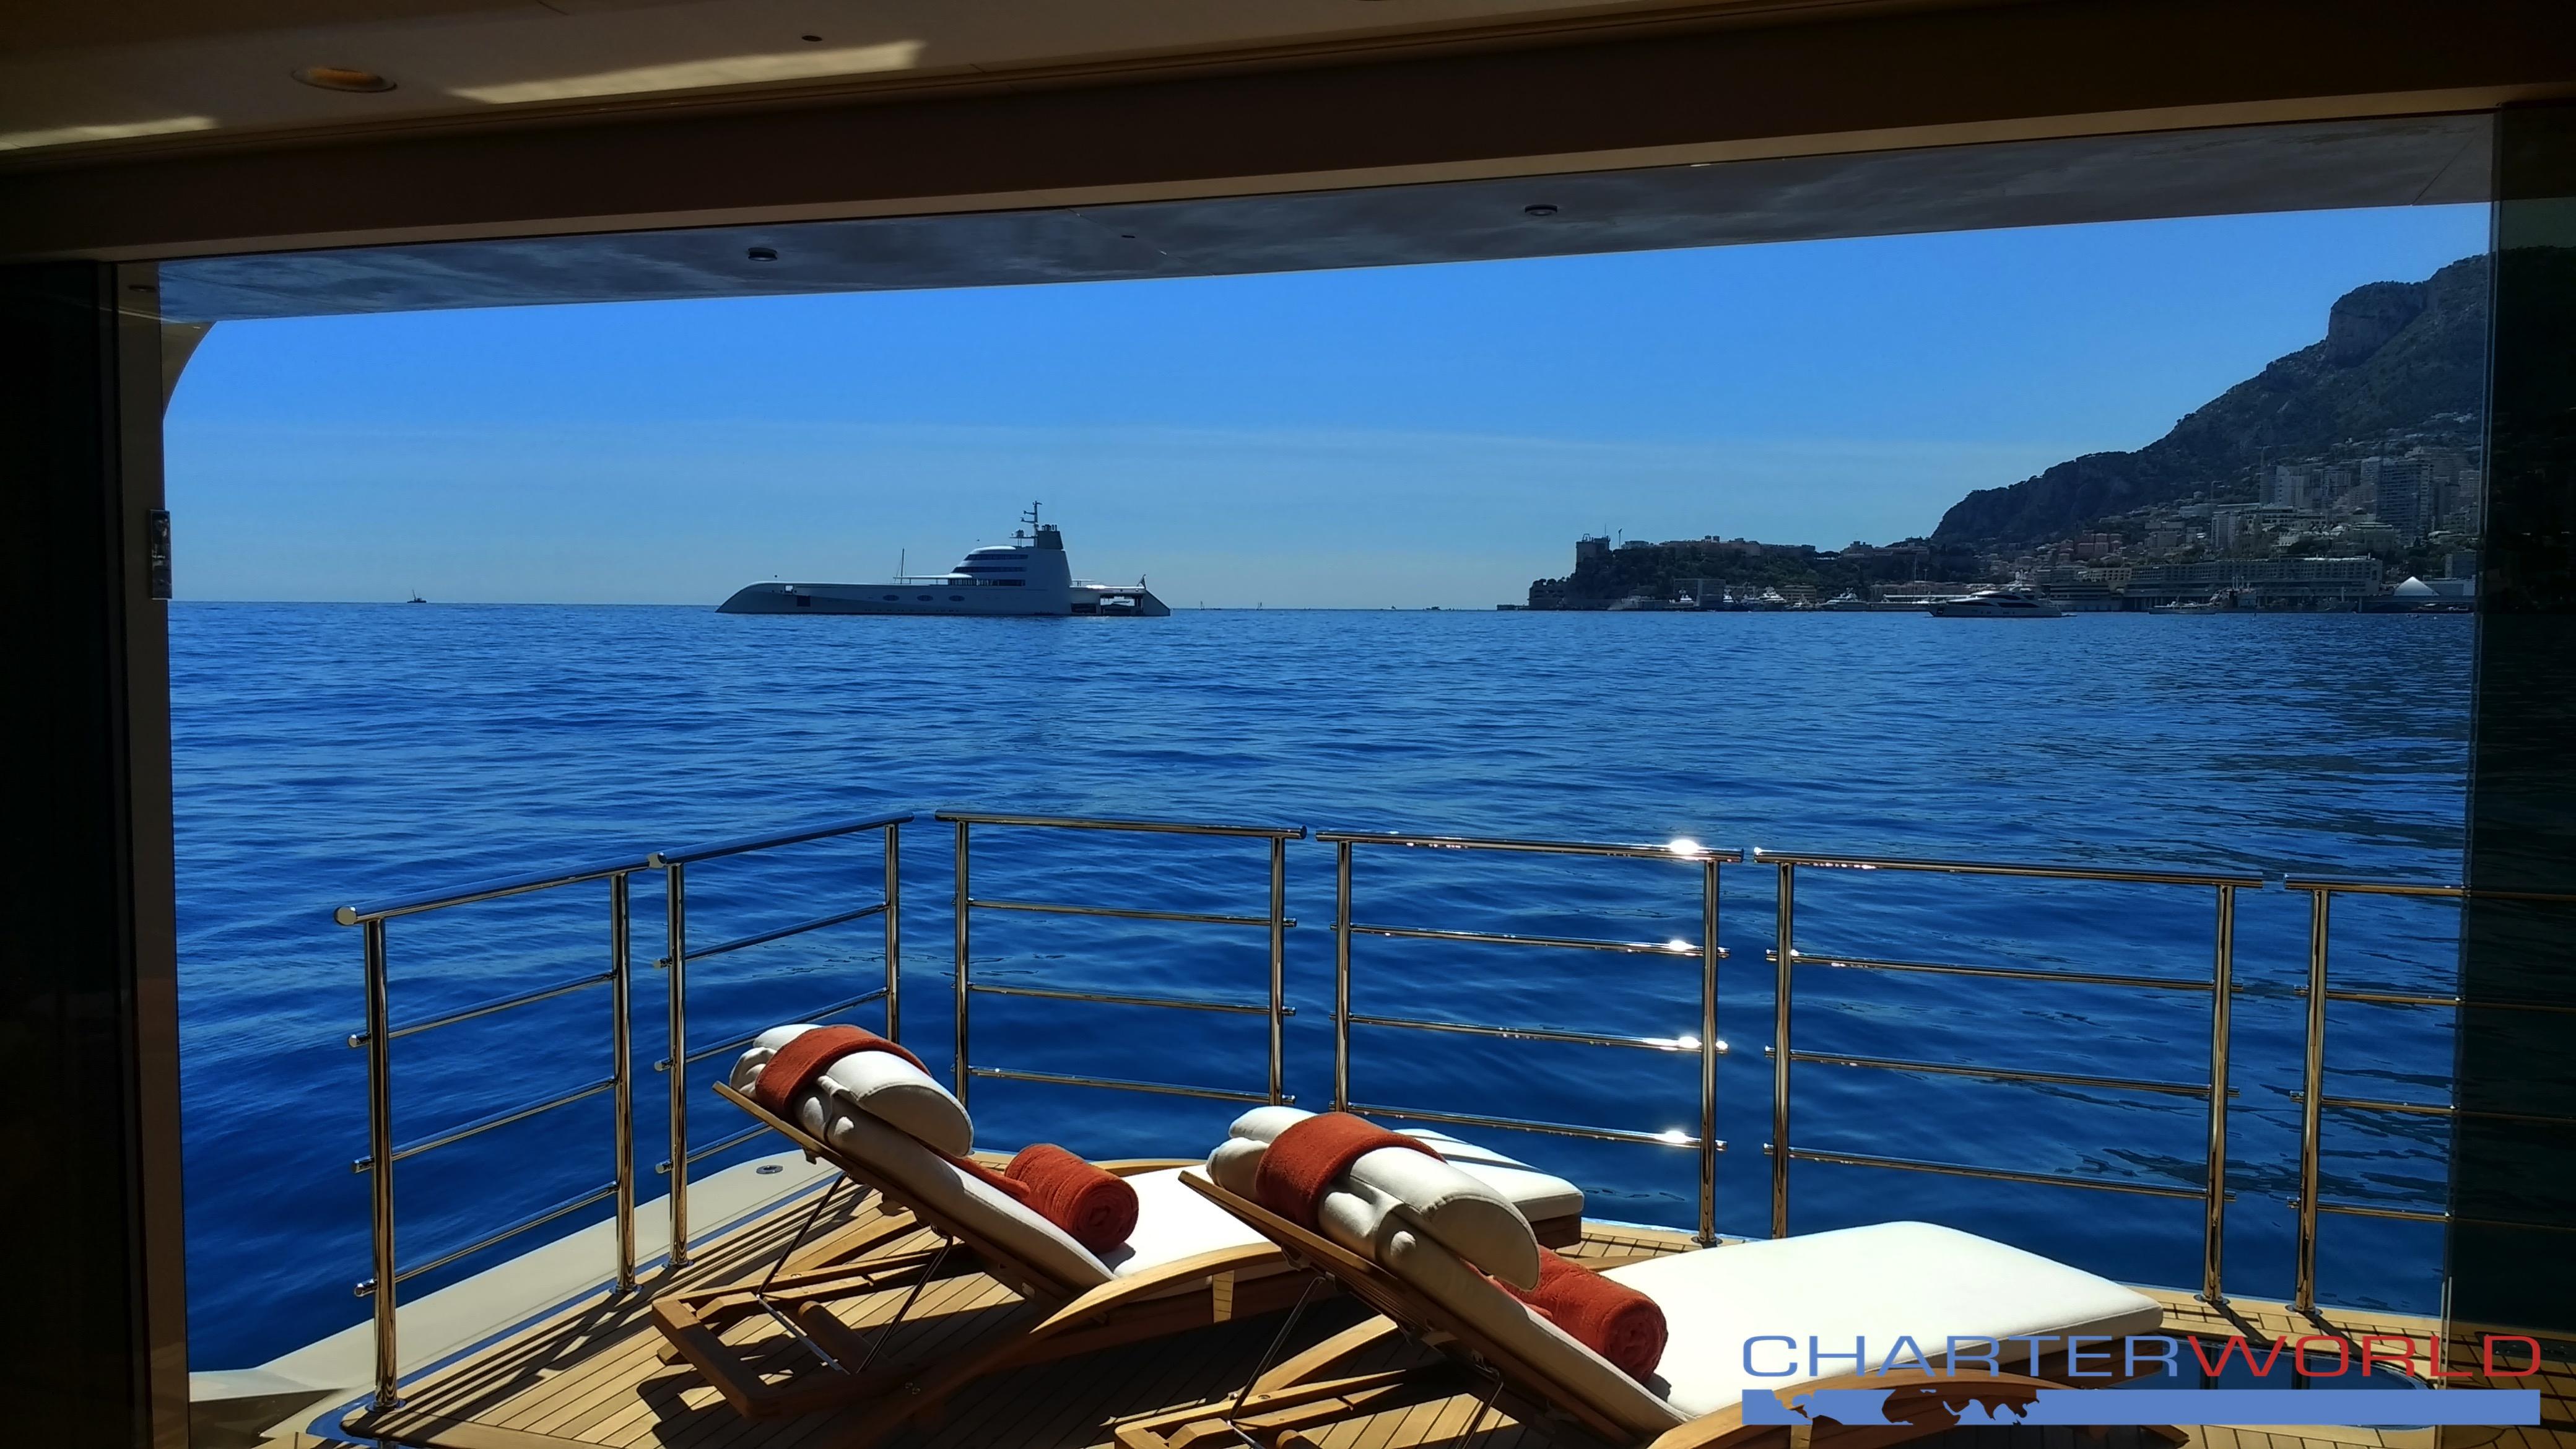 Motoro Yacht A. Monaco. Photo credit Nicolas Benazeth.CharterWorld